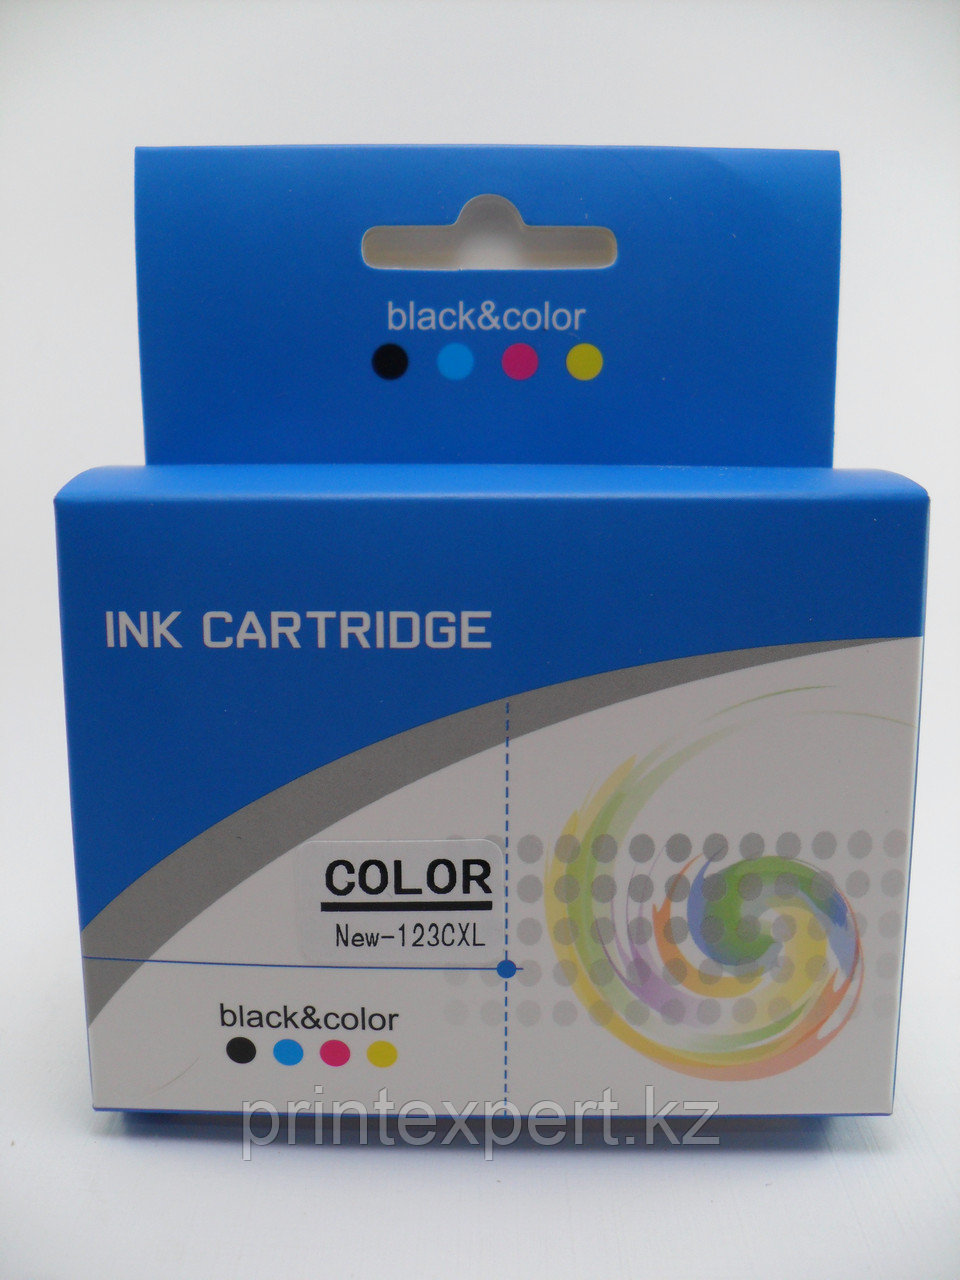 Картридж HP 123 color